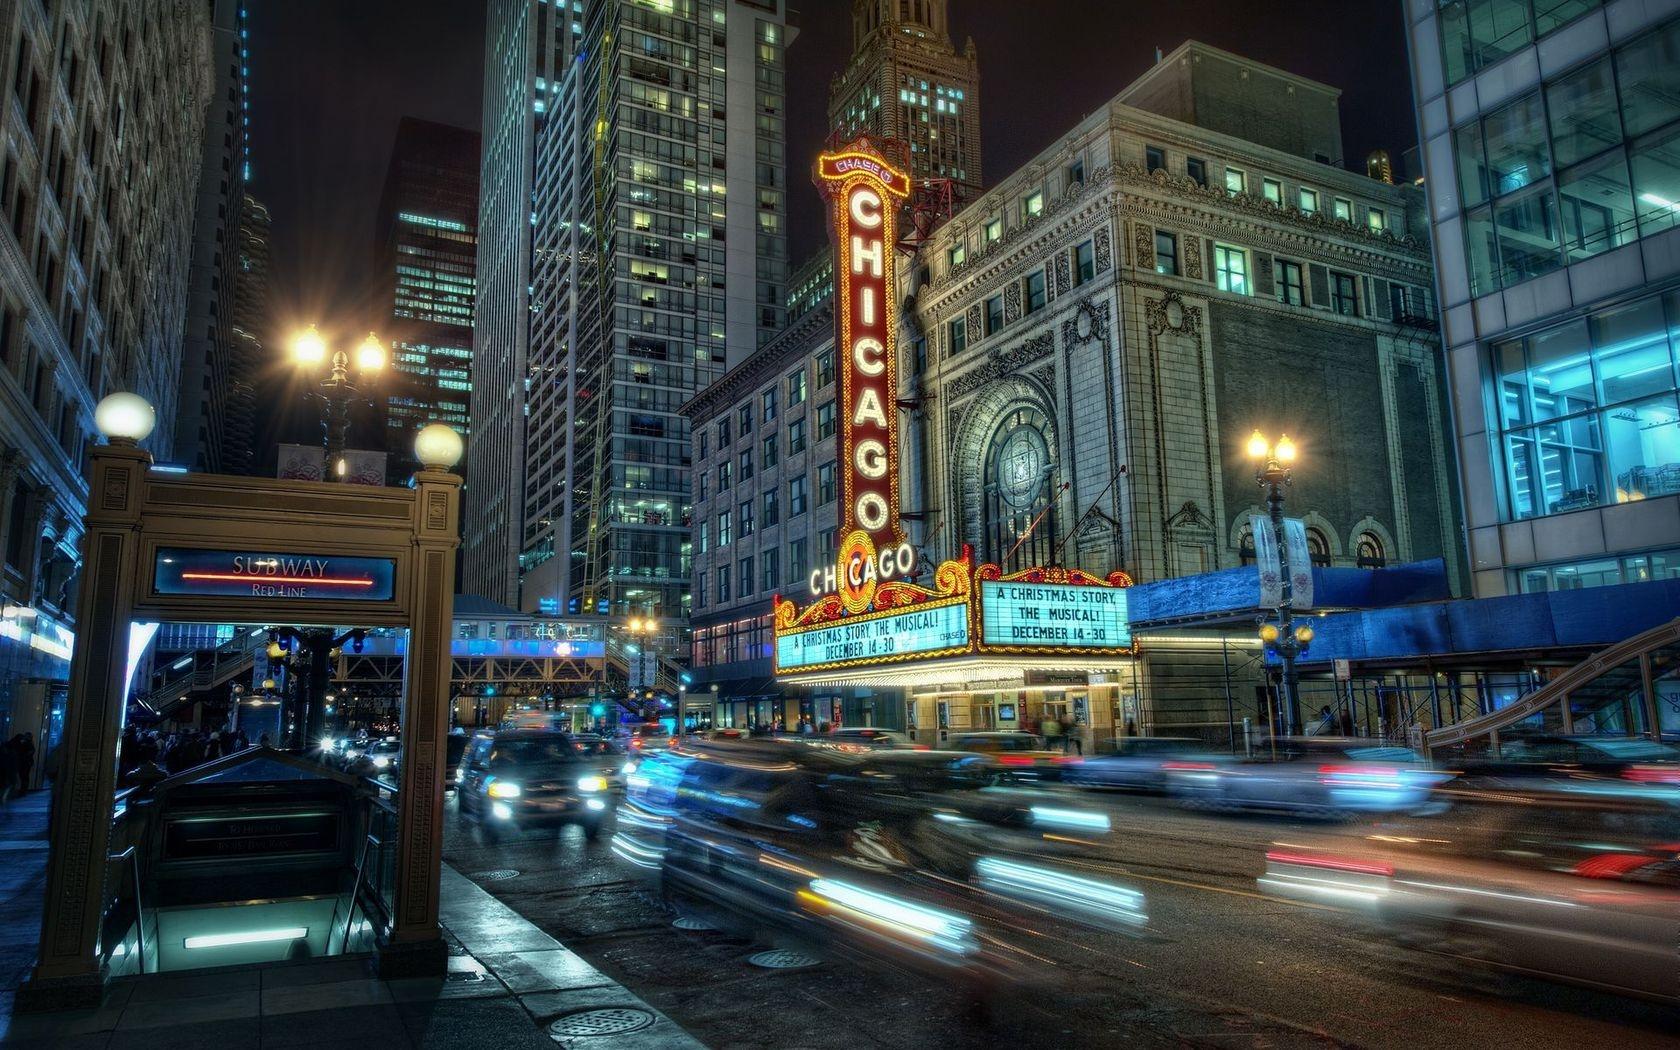 Chicago City Night Lights Buildings Wallpaper Hd City 4k